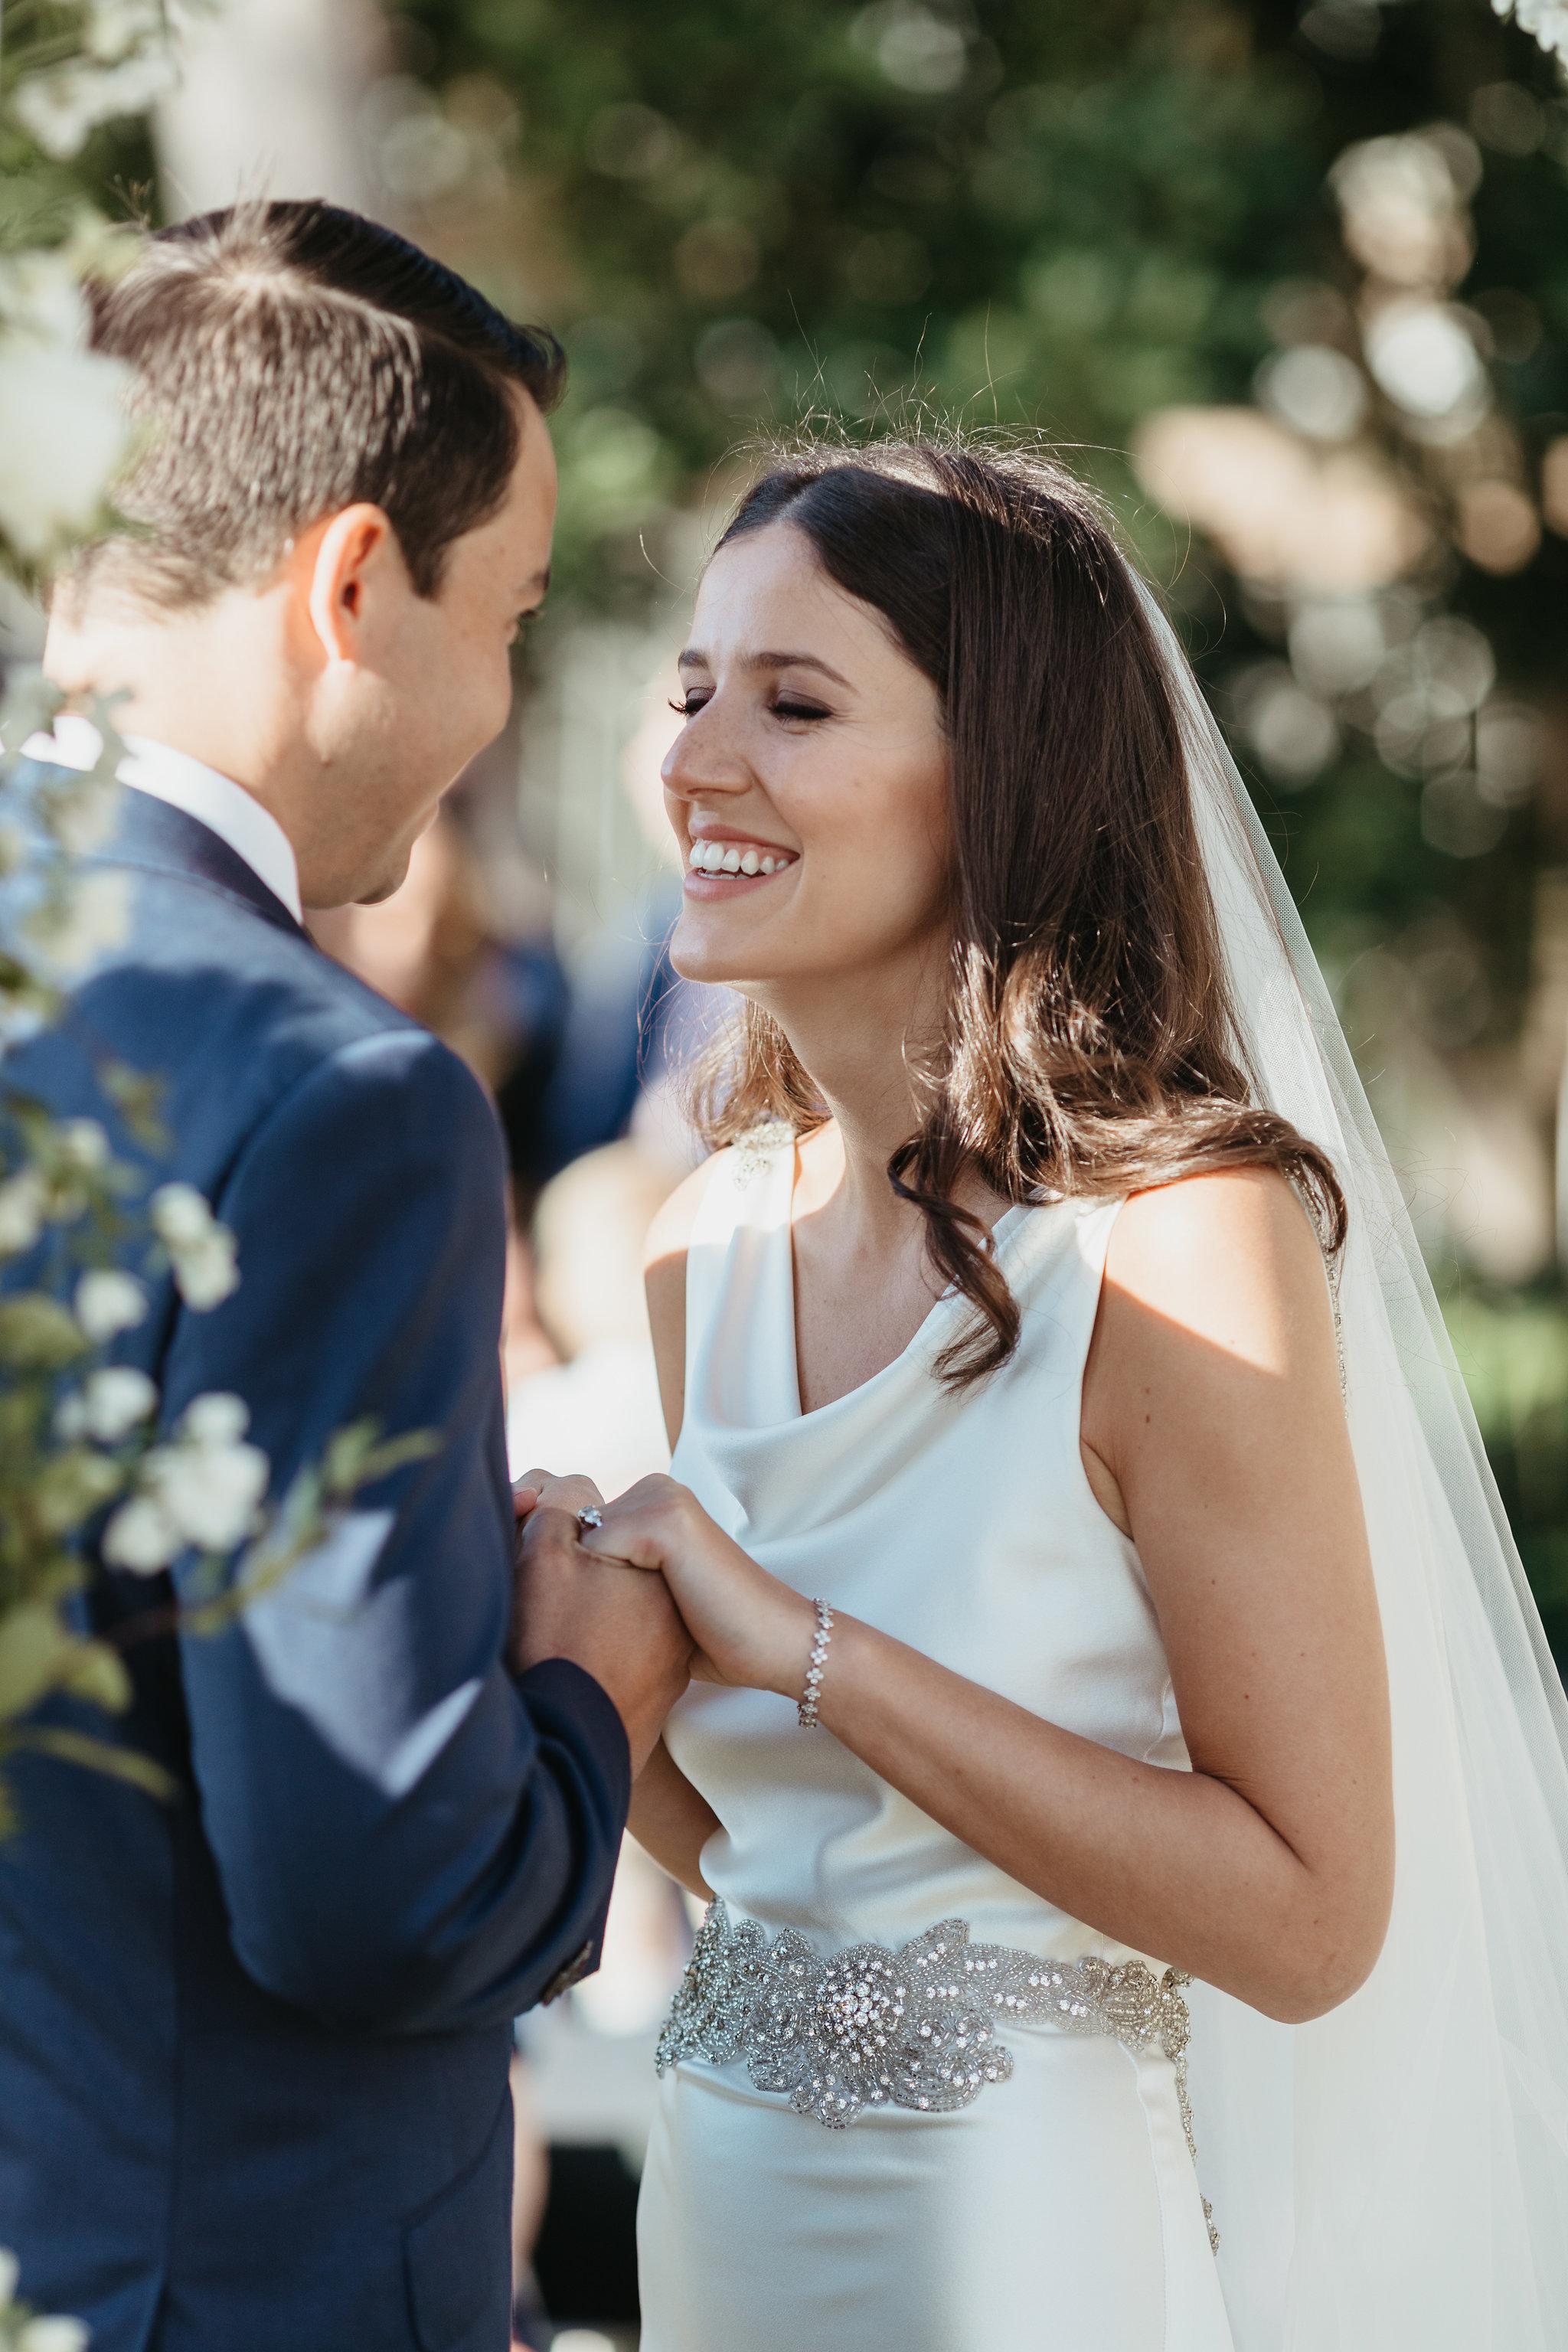 gen_chris_story_of_us_wedding-0293.JPG